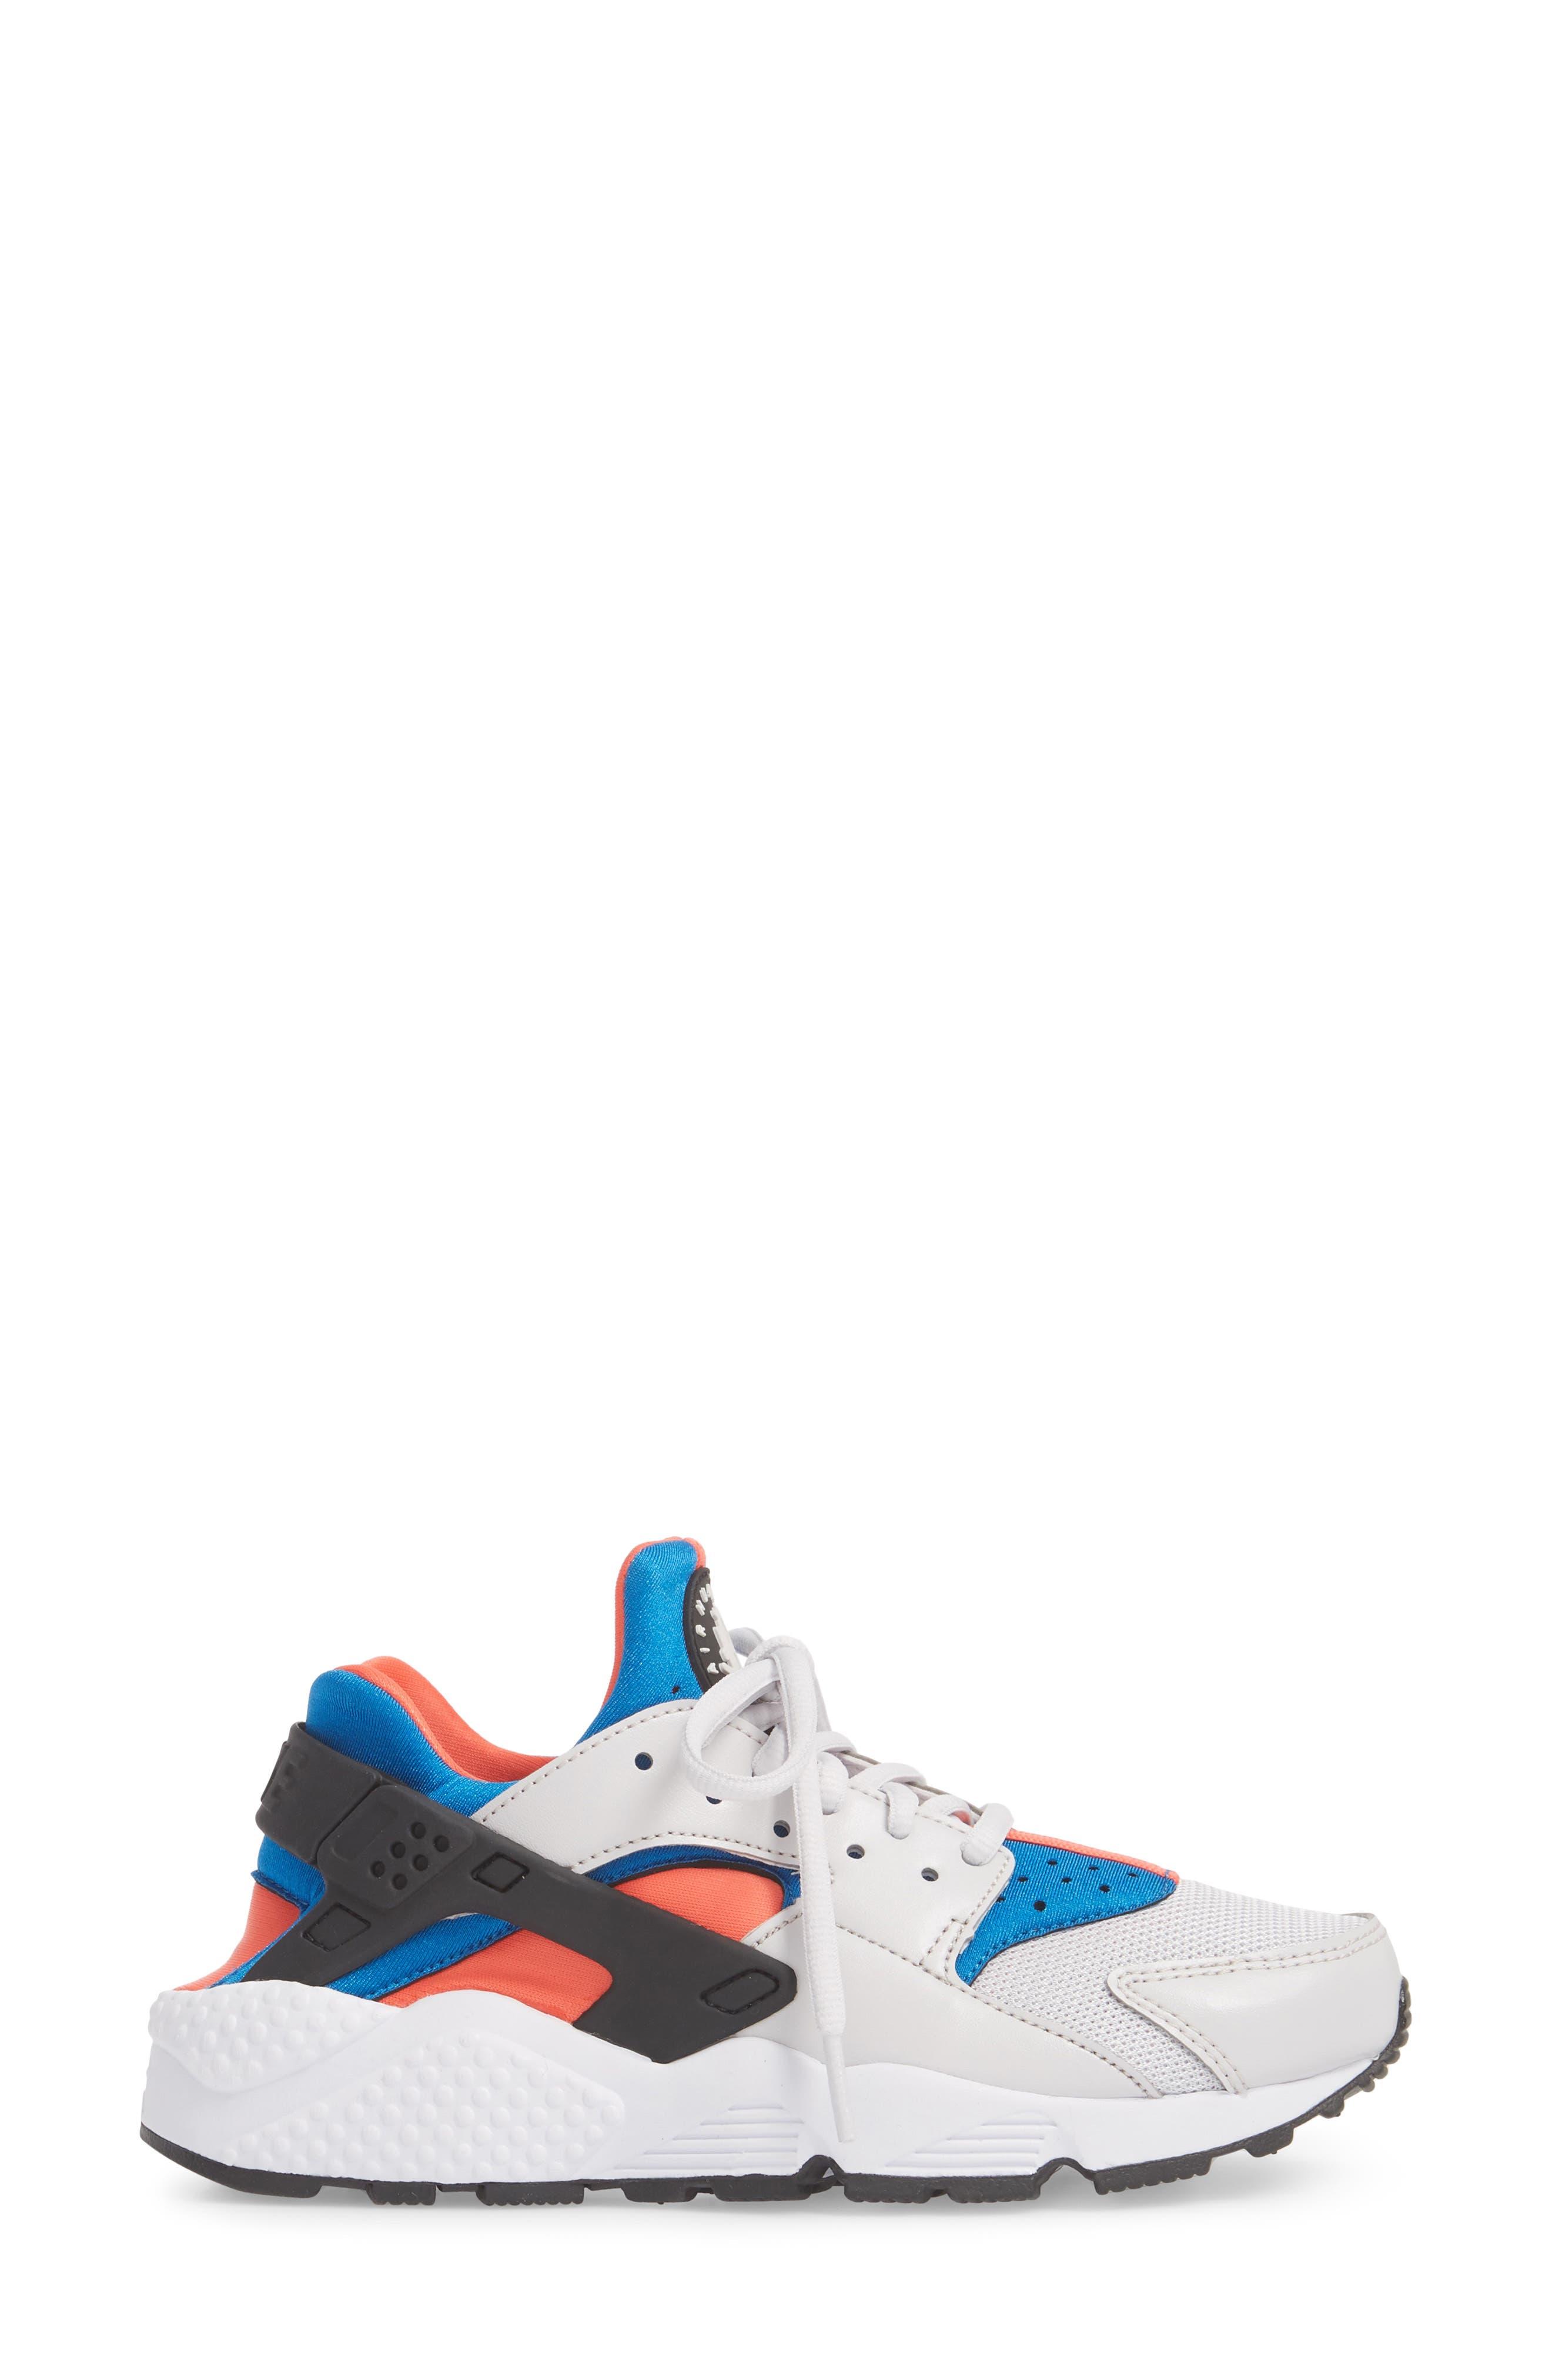 Air Huarache Run Sneaker,                             Alternate thumbnail 3, color,                             Grey/ Black/ Coral/ Nebula